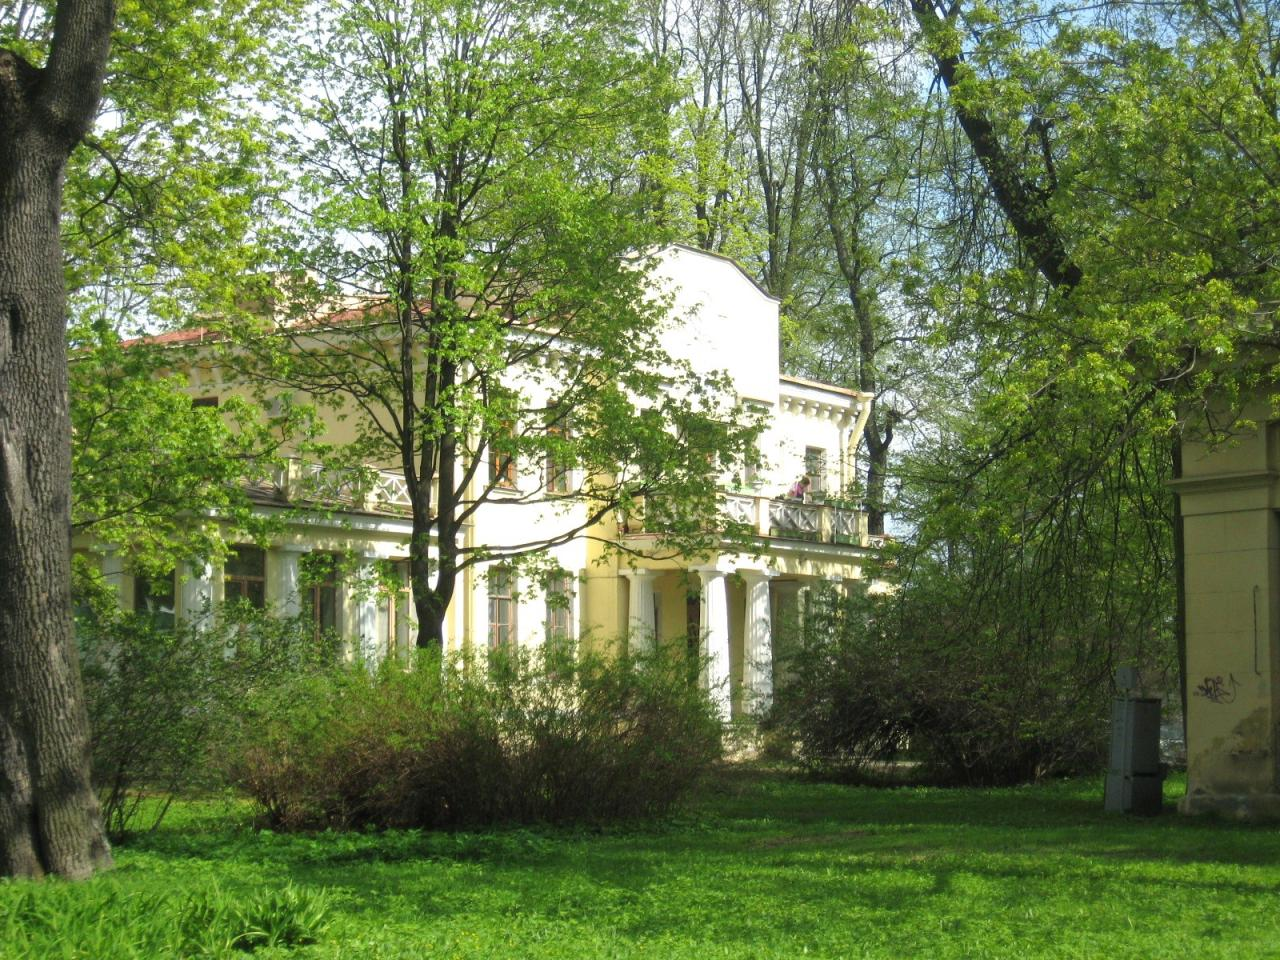 7. Дом Бехтерева. Фото: Тамара Николаевна, 2008 Добавил - IVa